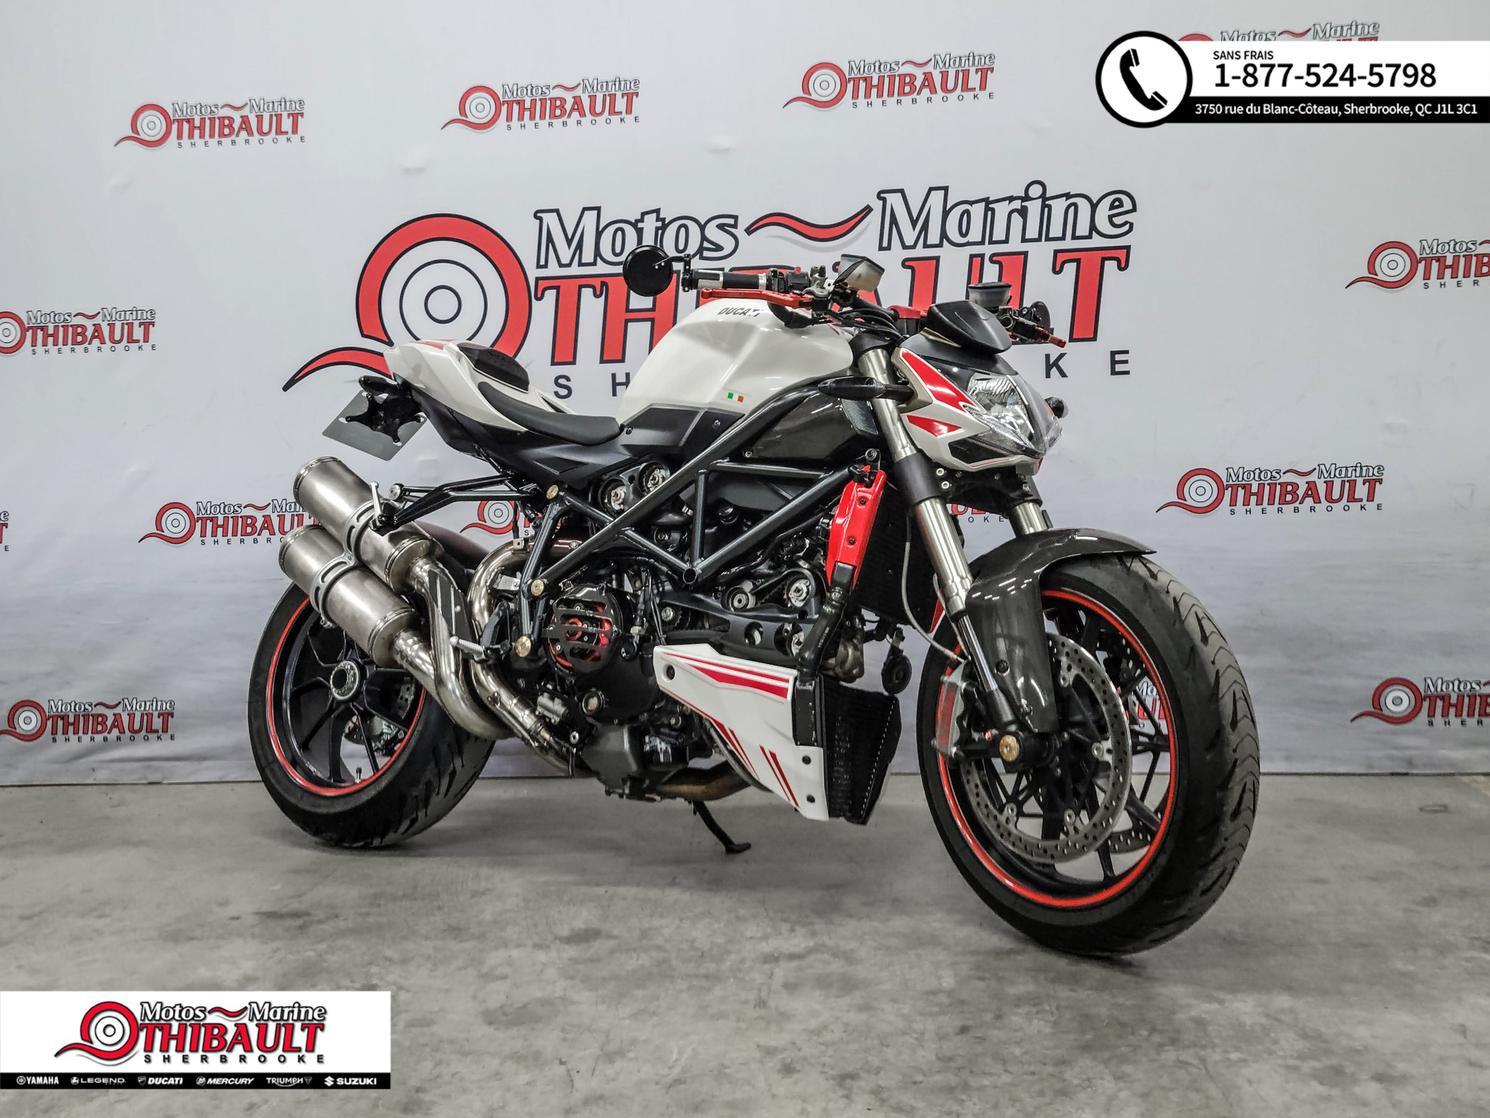 2010 Ducati Streetfighter F 1098